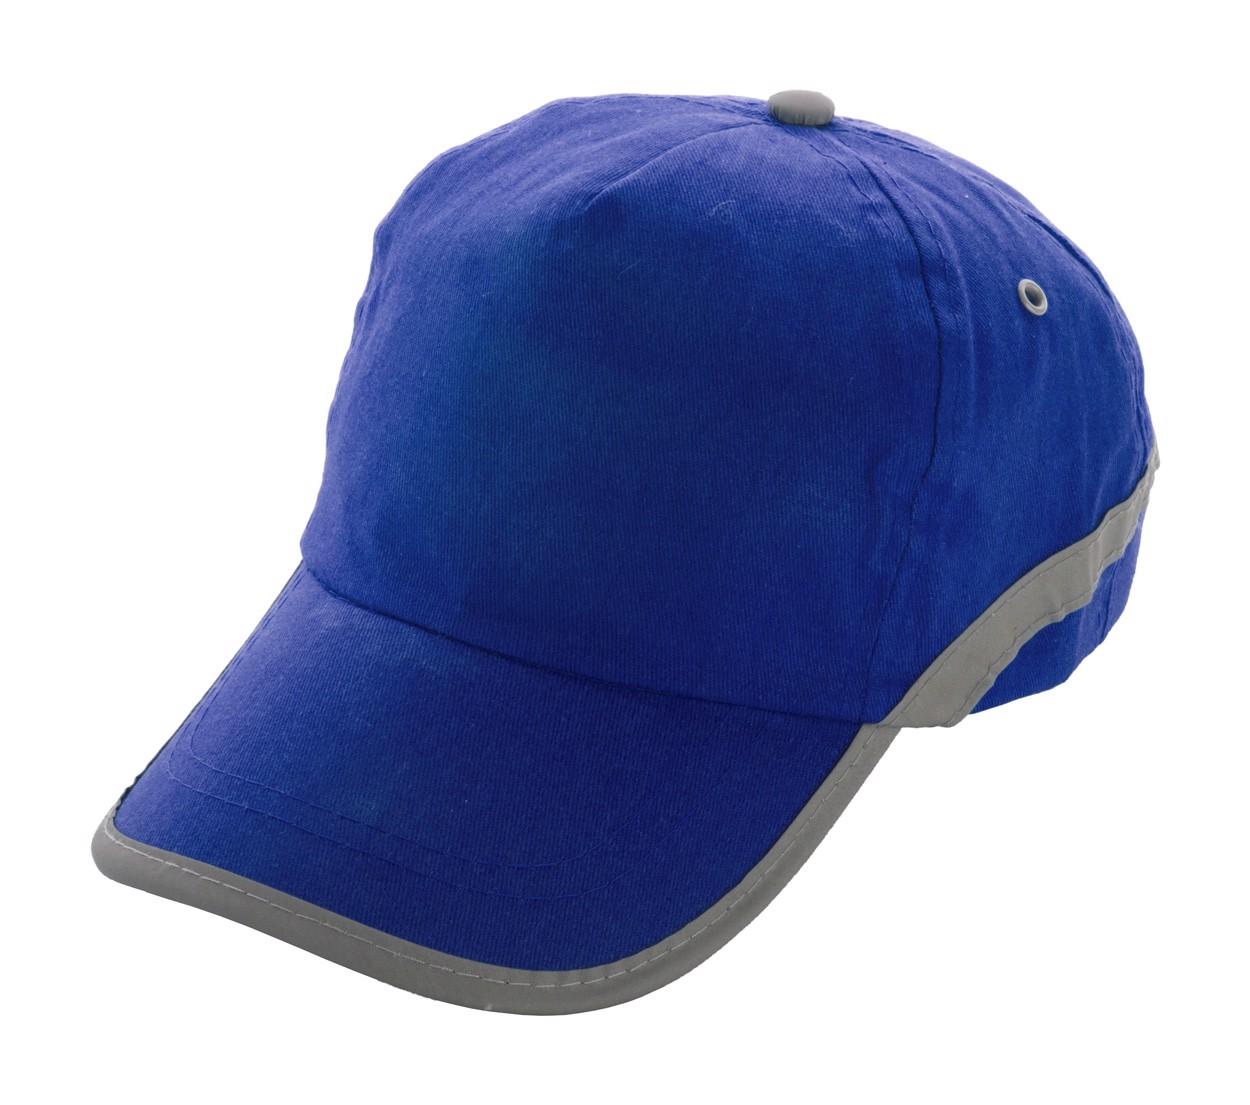 Baseballová Čepice Tarea - Modrá